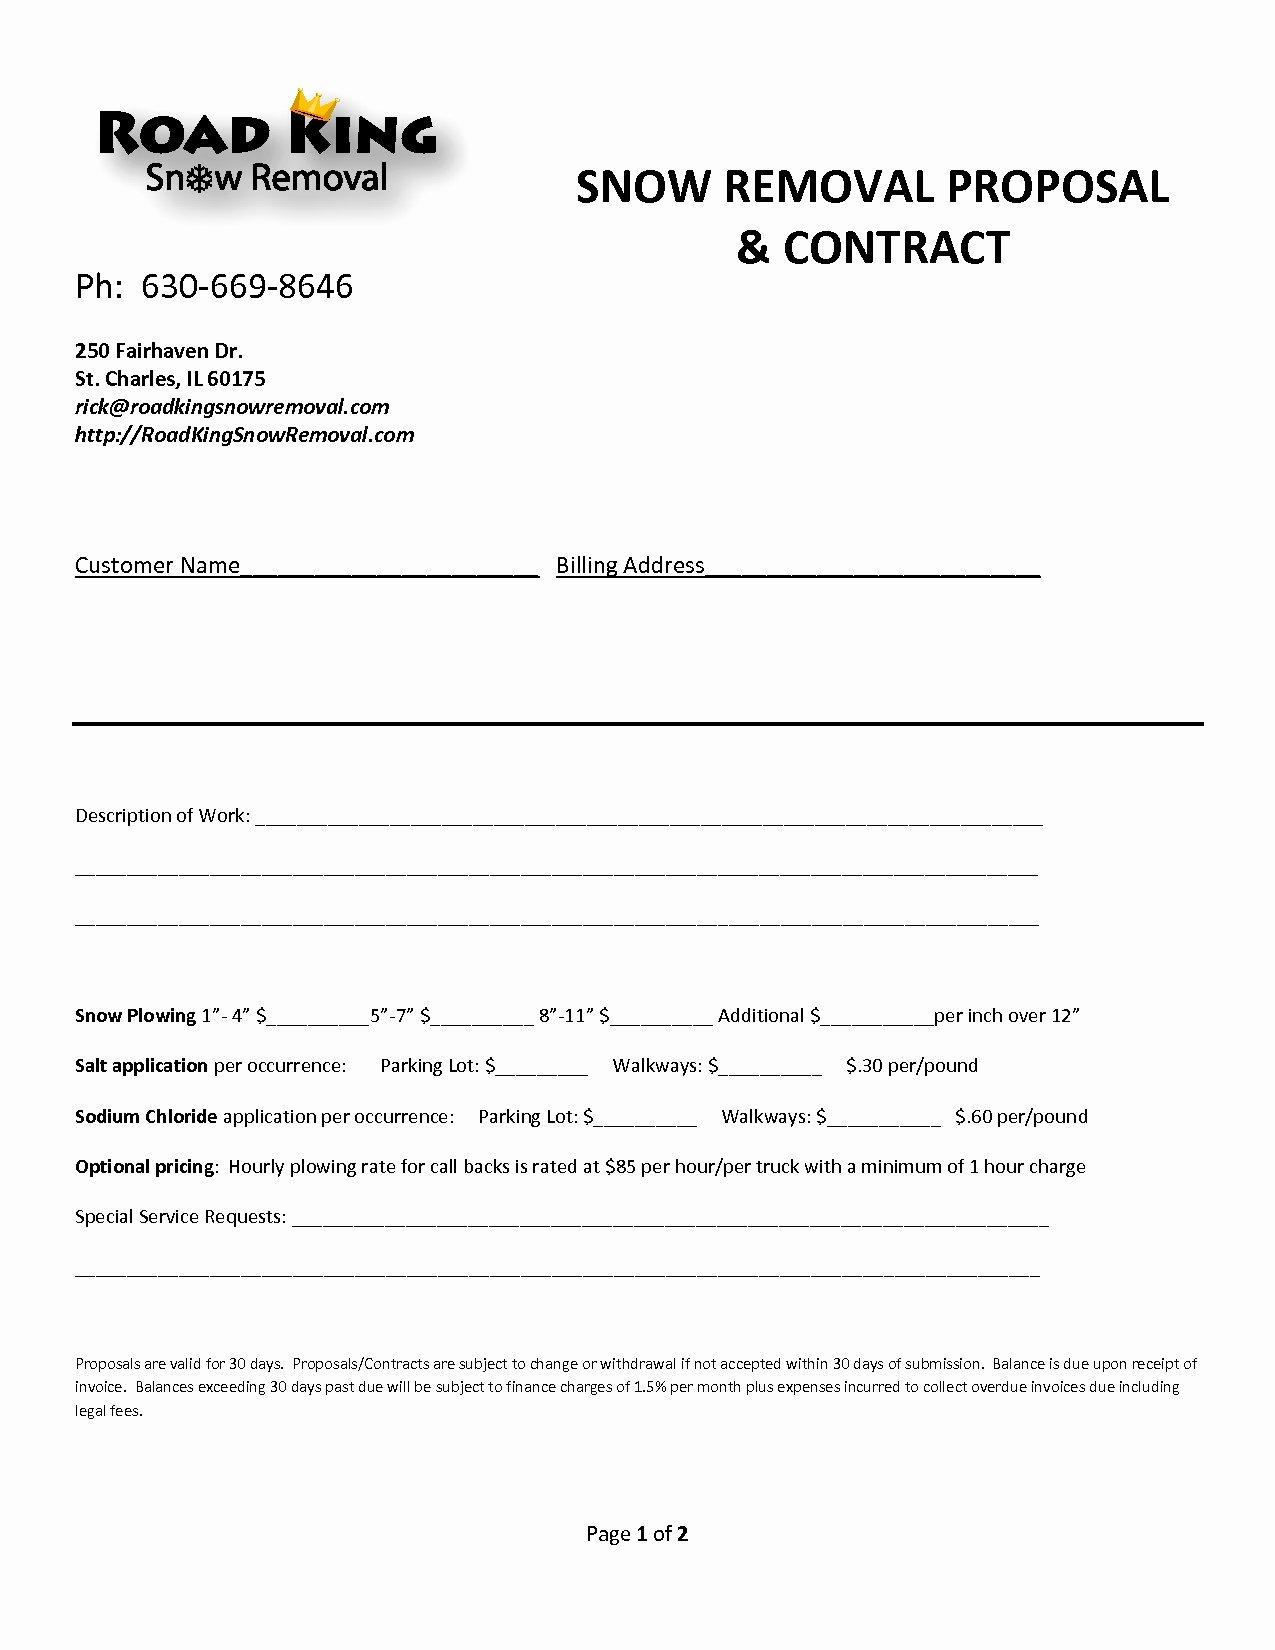 Snow Removal Contract Template Unique Snow Removal Invoice Invoice Template Ideas